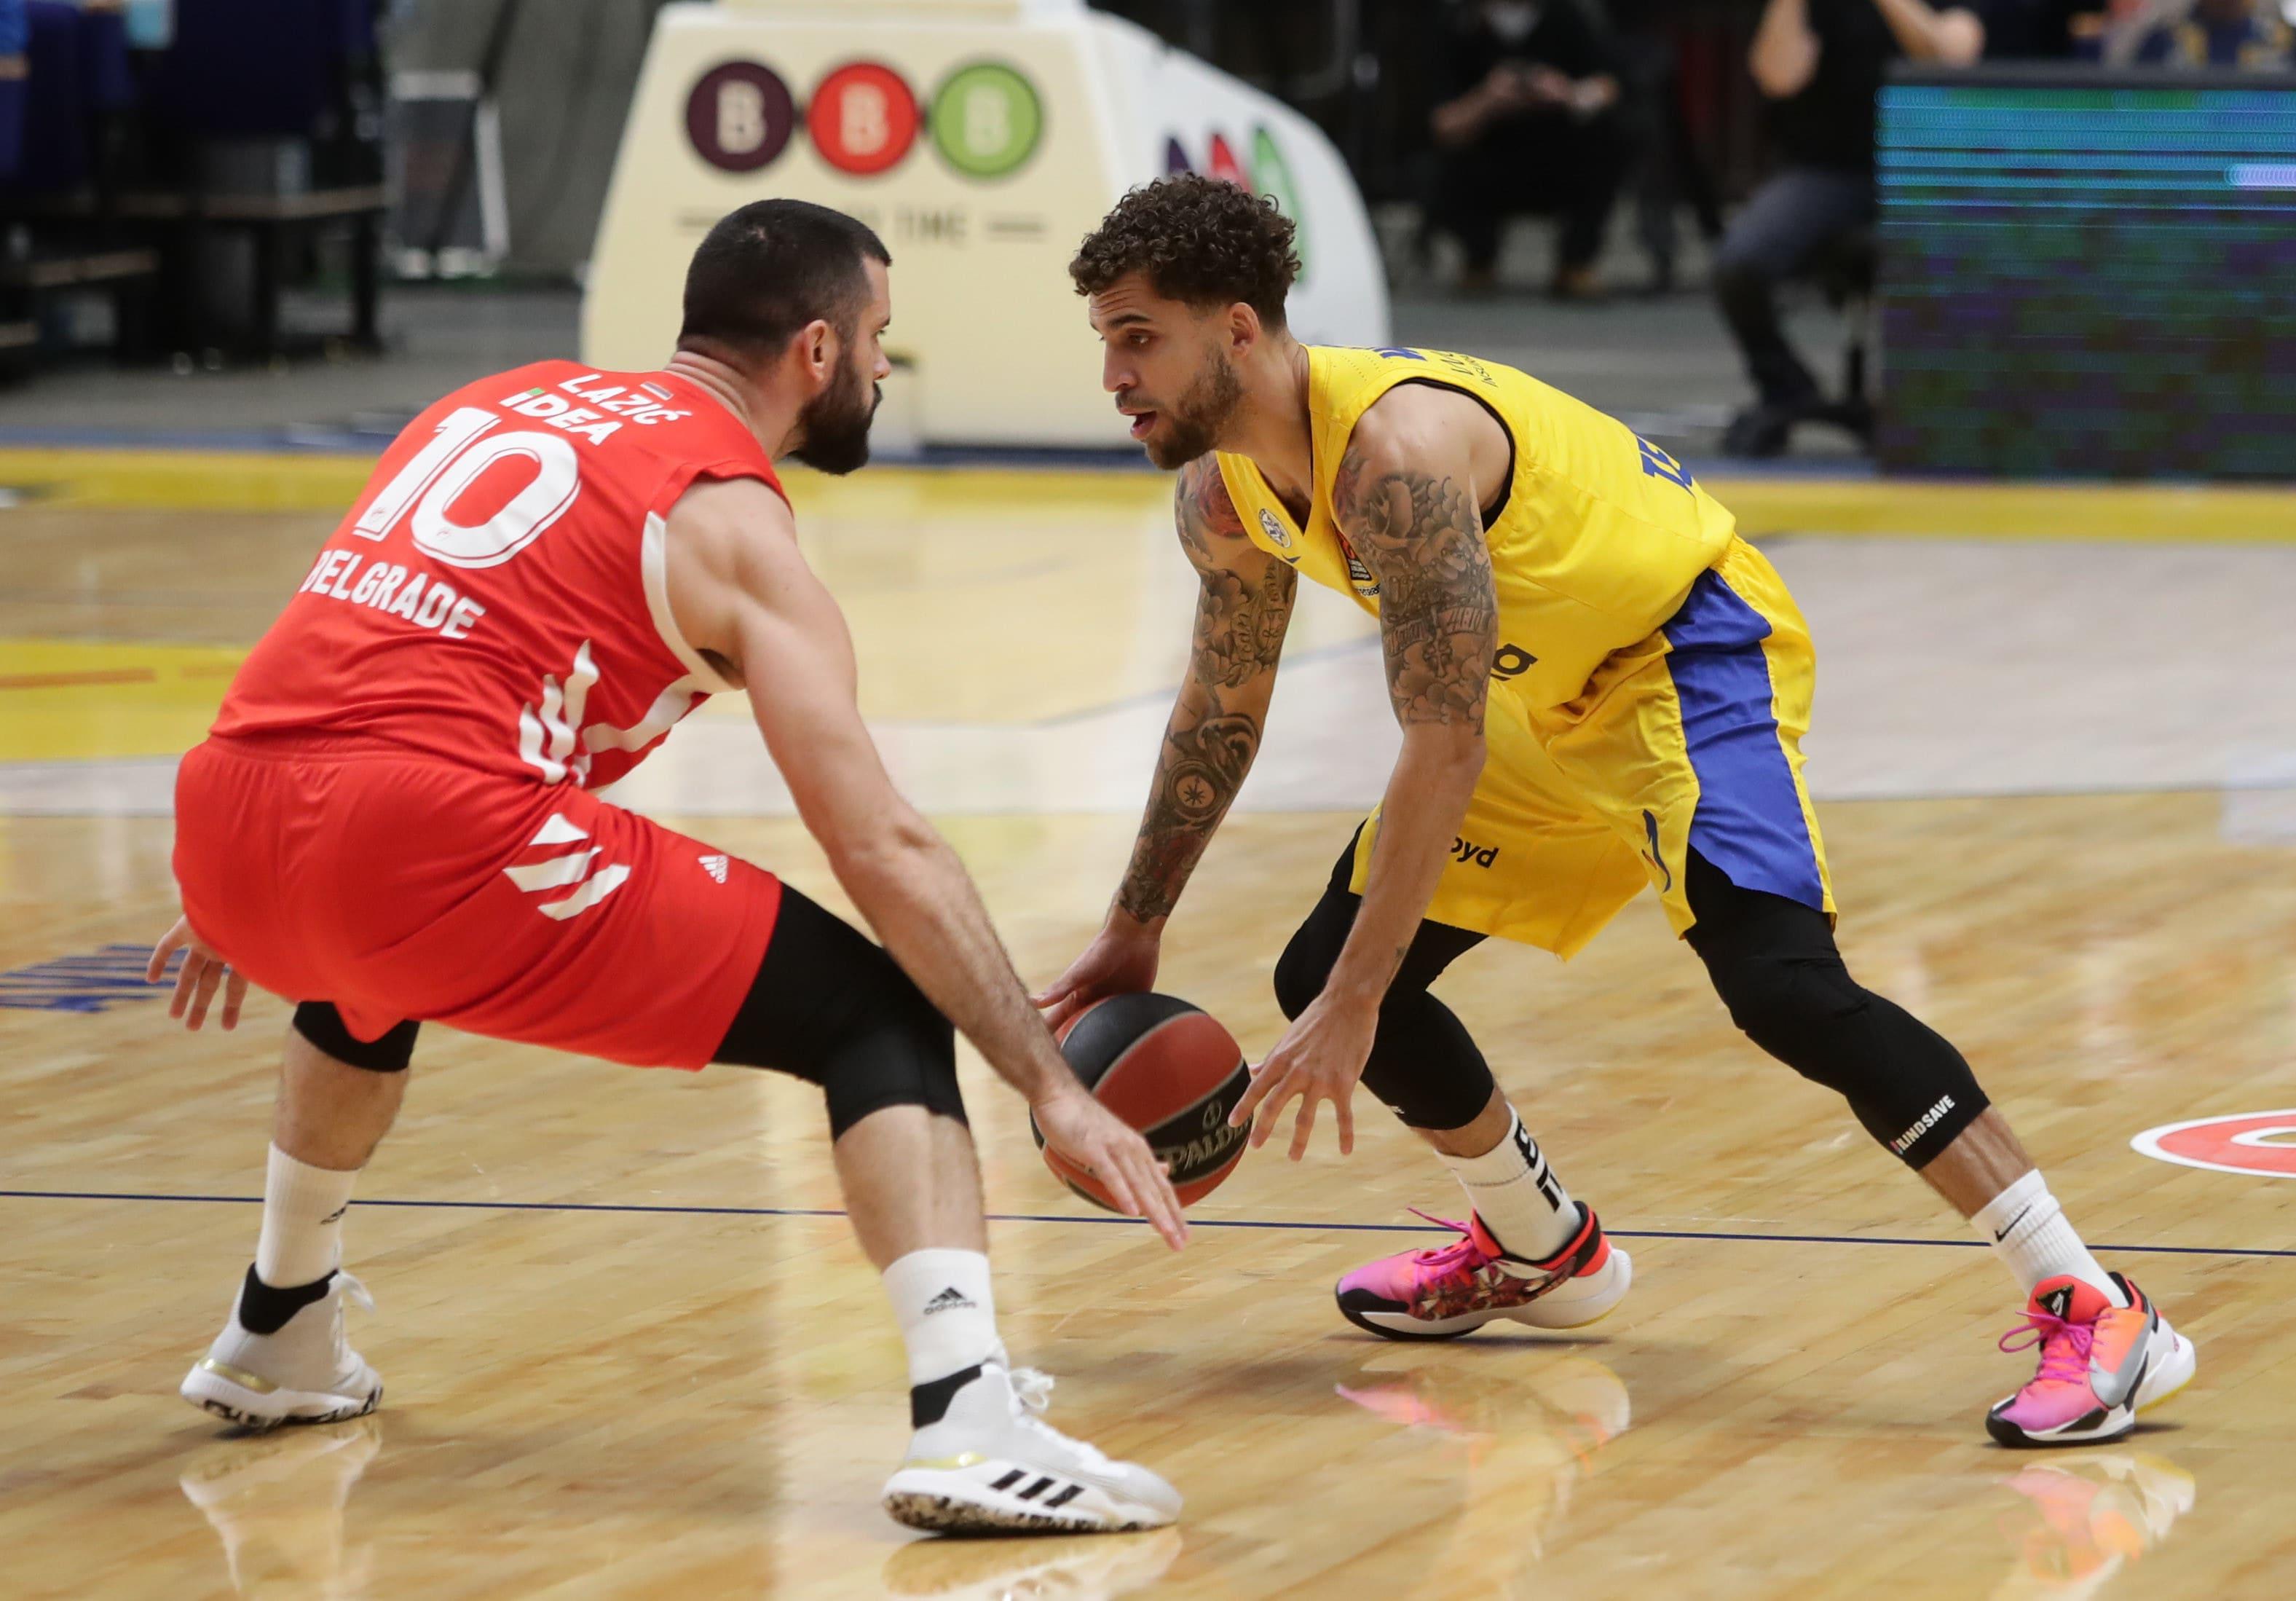 Maccabi Tel Aviv player Scotty Wilbkin against Red Star player Belgrade Branko Lazic